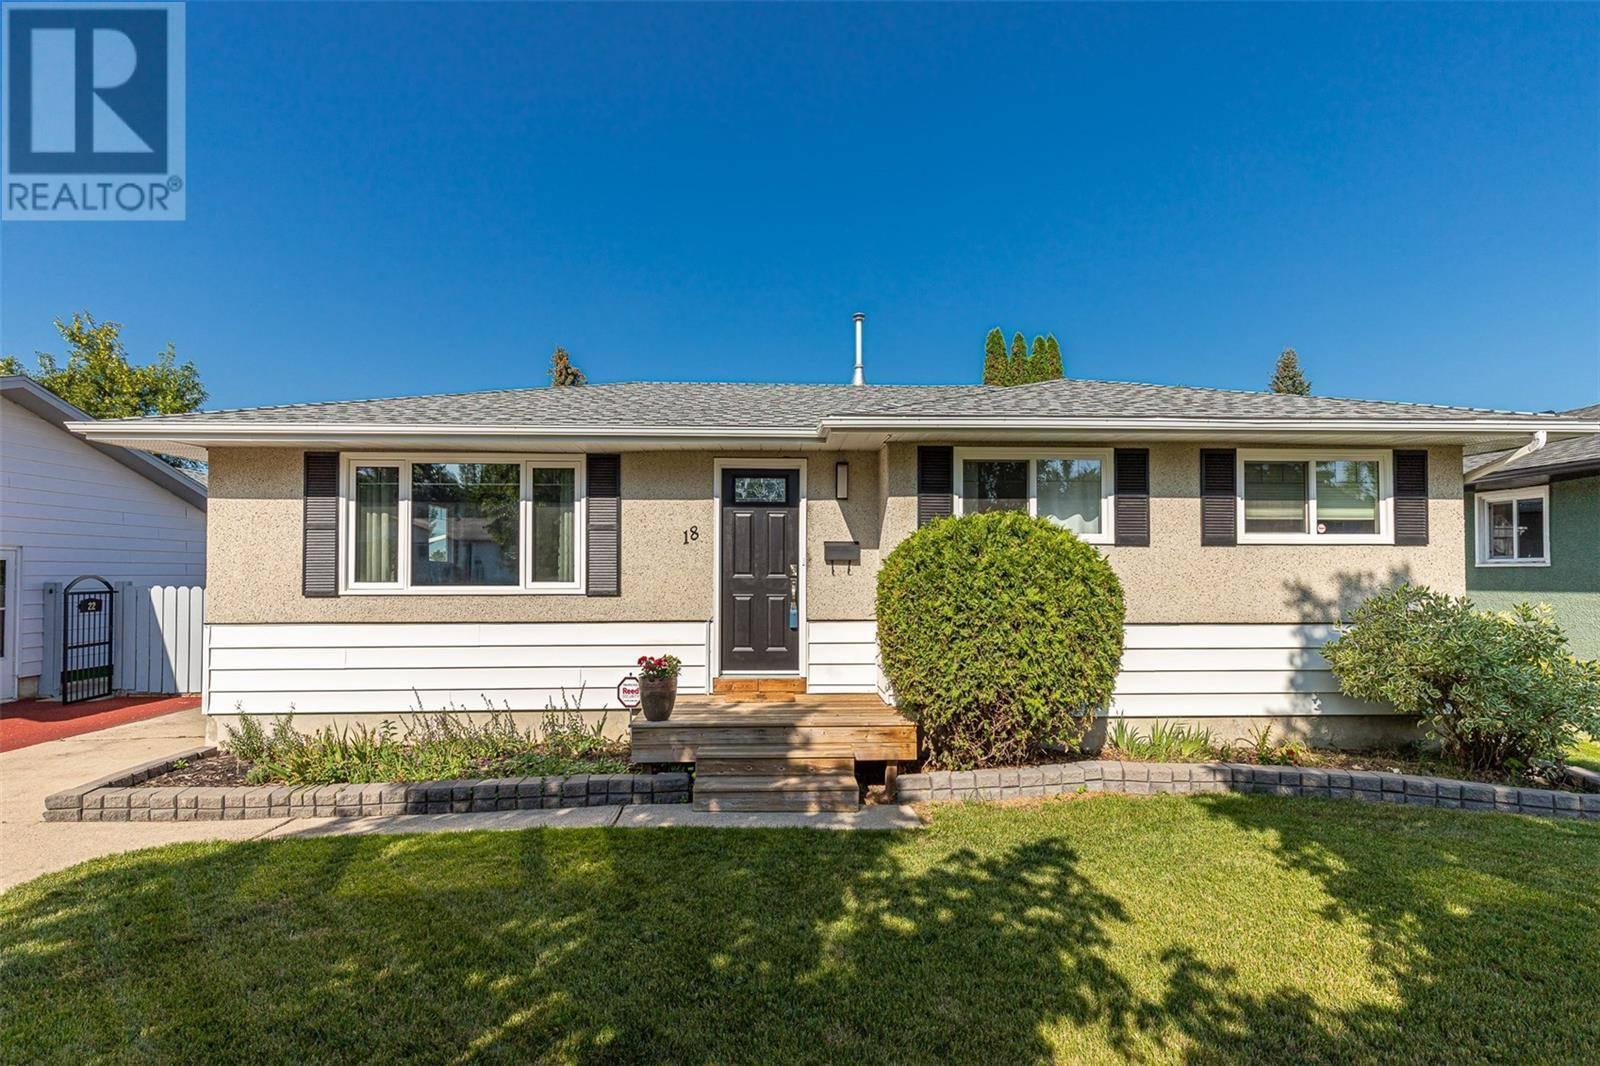 House for sale at 18 Dumont Cres Saskatoon Saskatchewan - MLS: SK783033